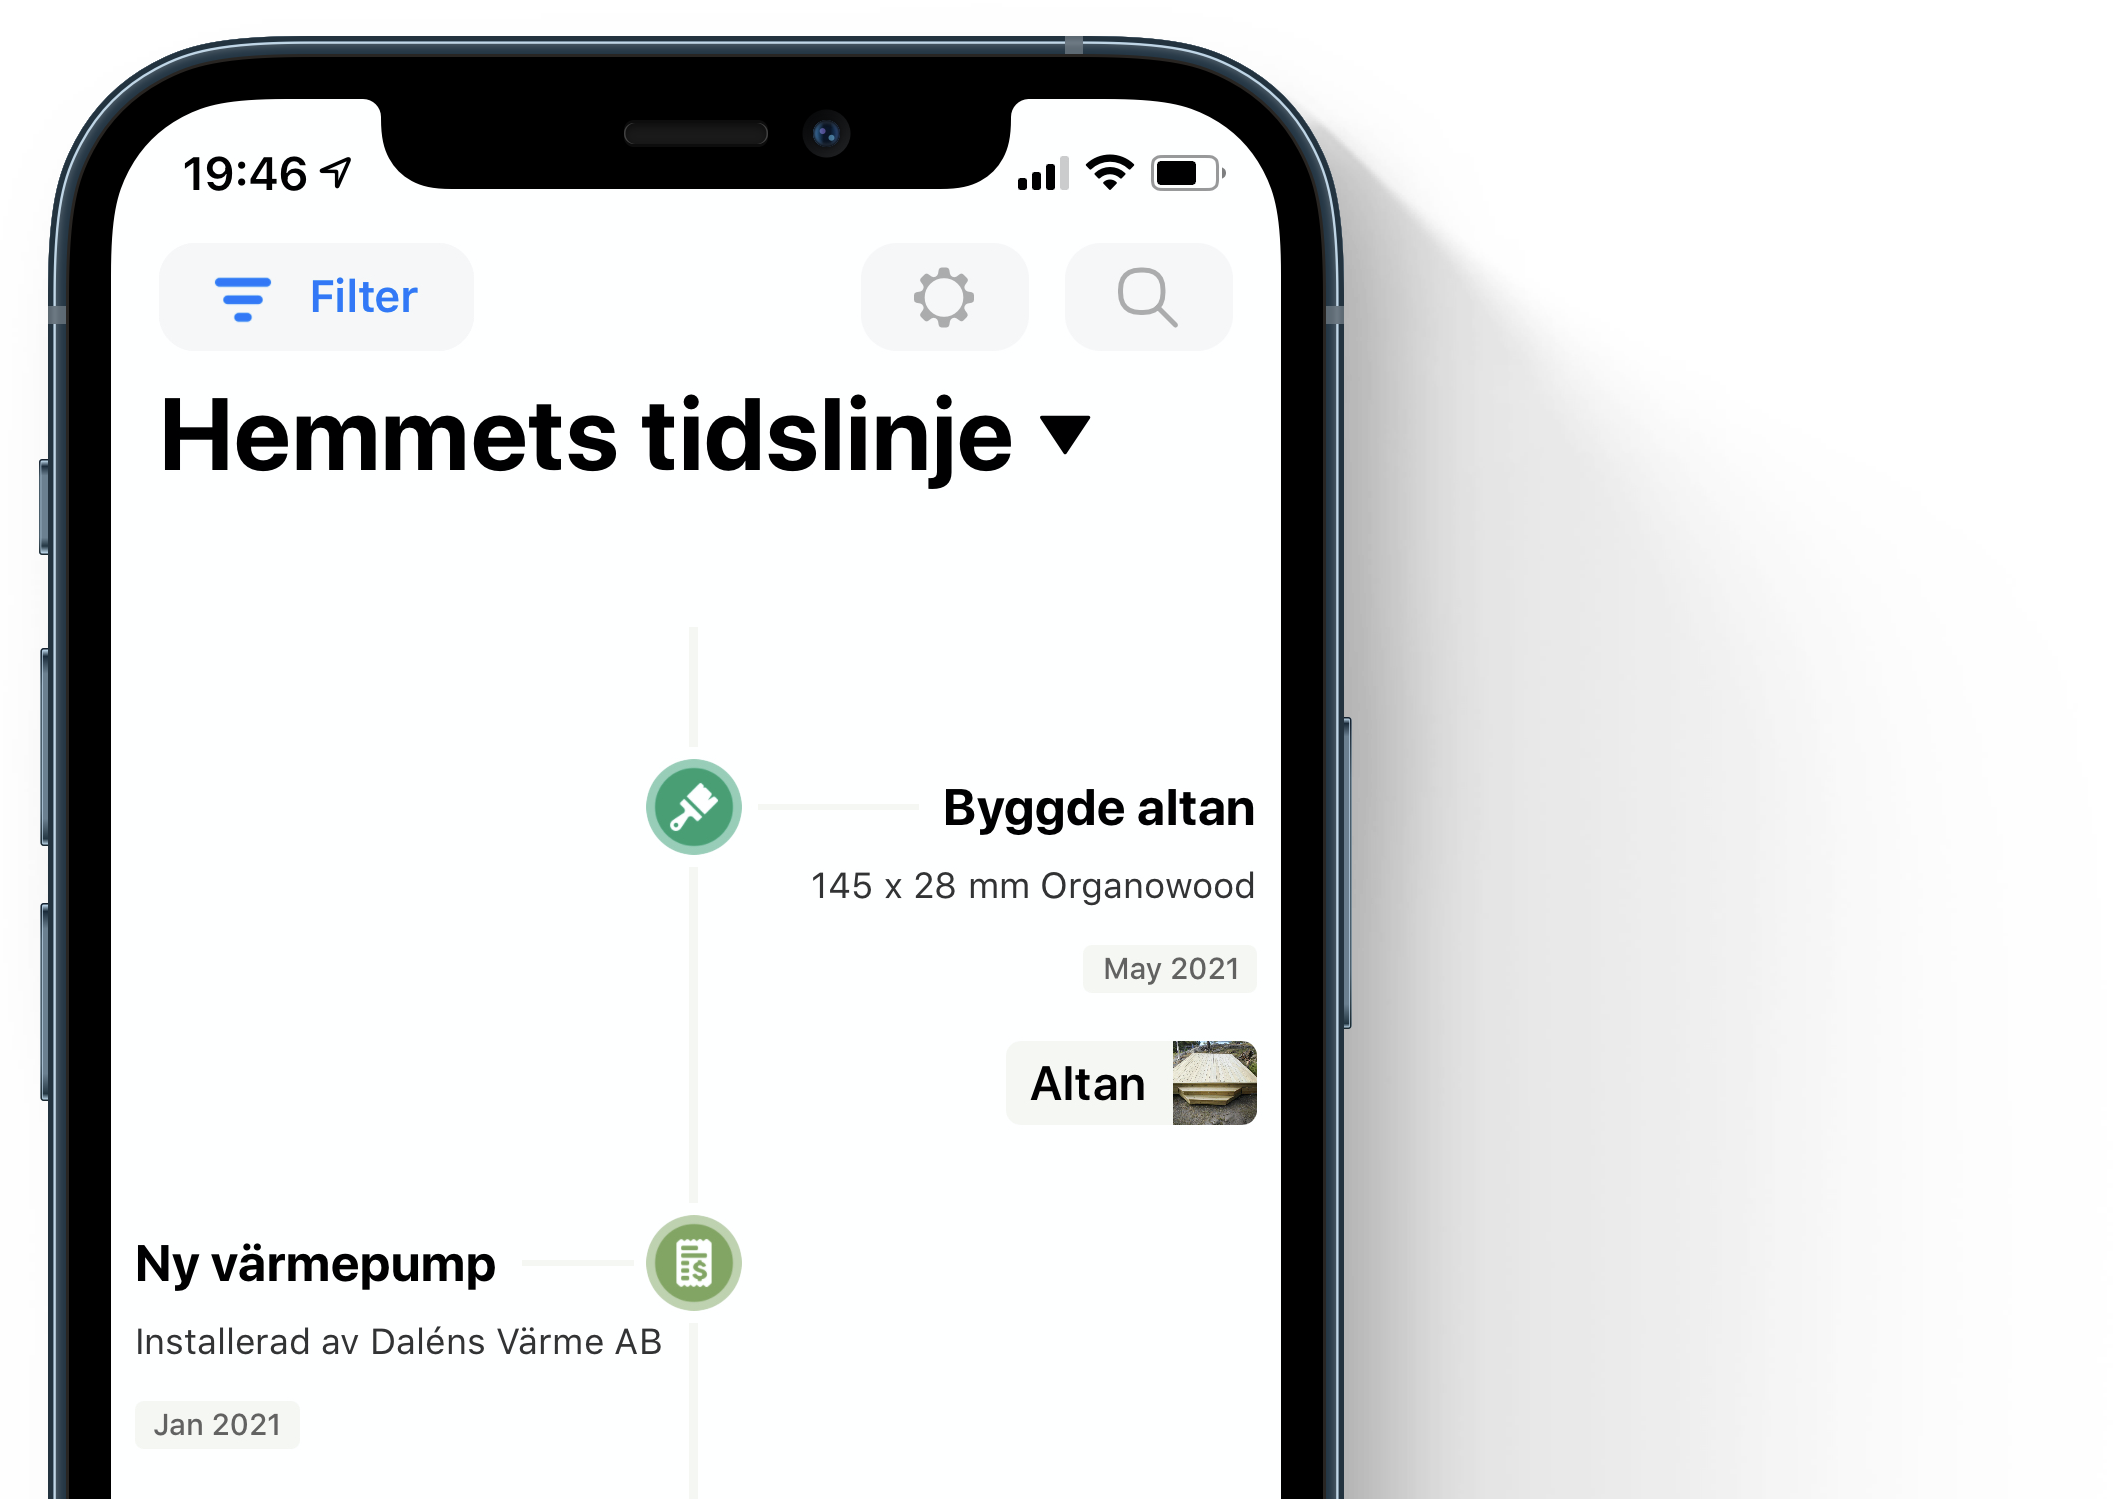 Homer timeline photo in swedish